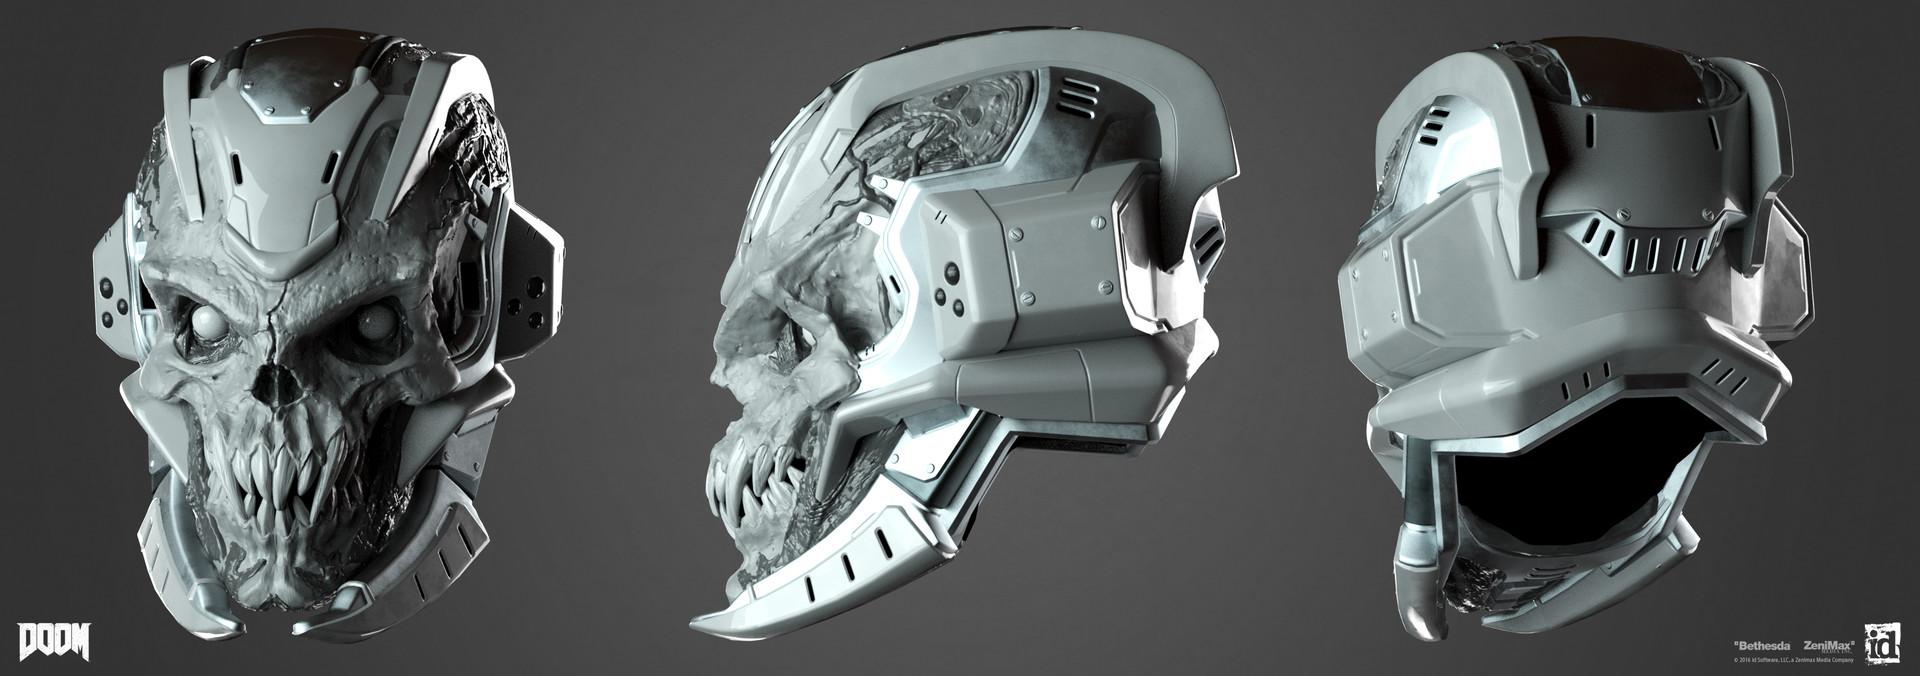 Emanuel palalic cyberdemonic helmet